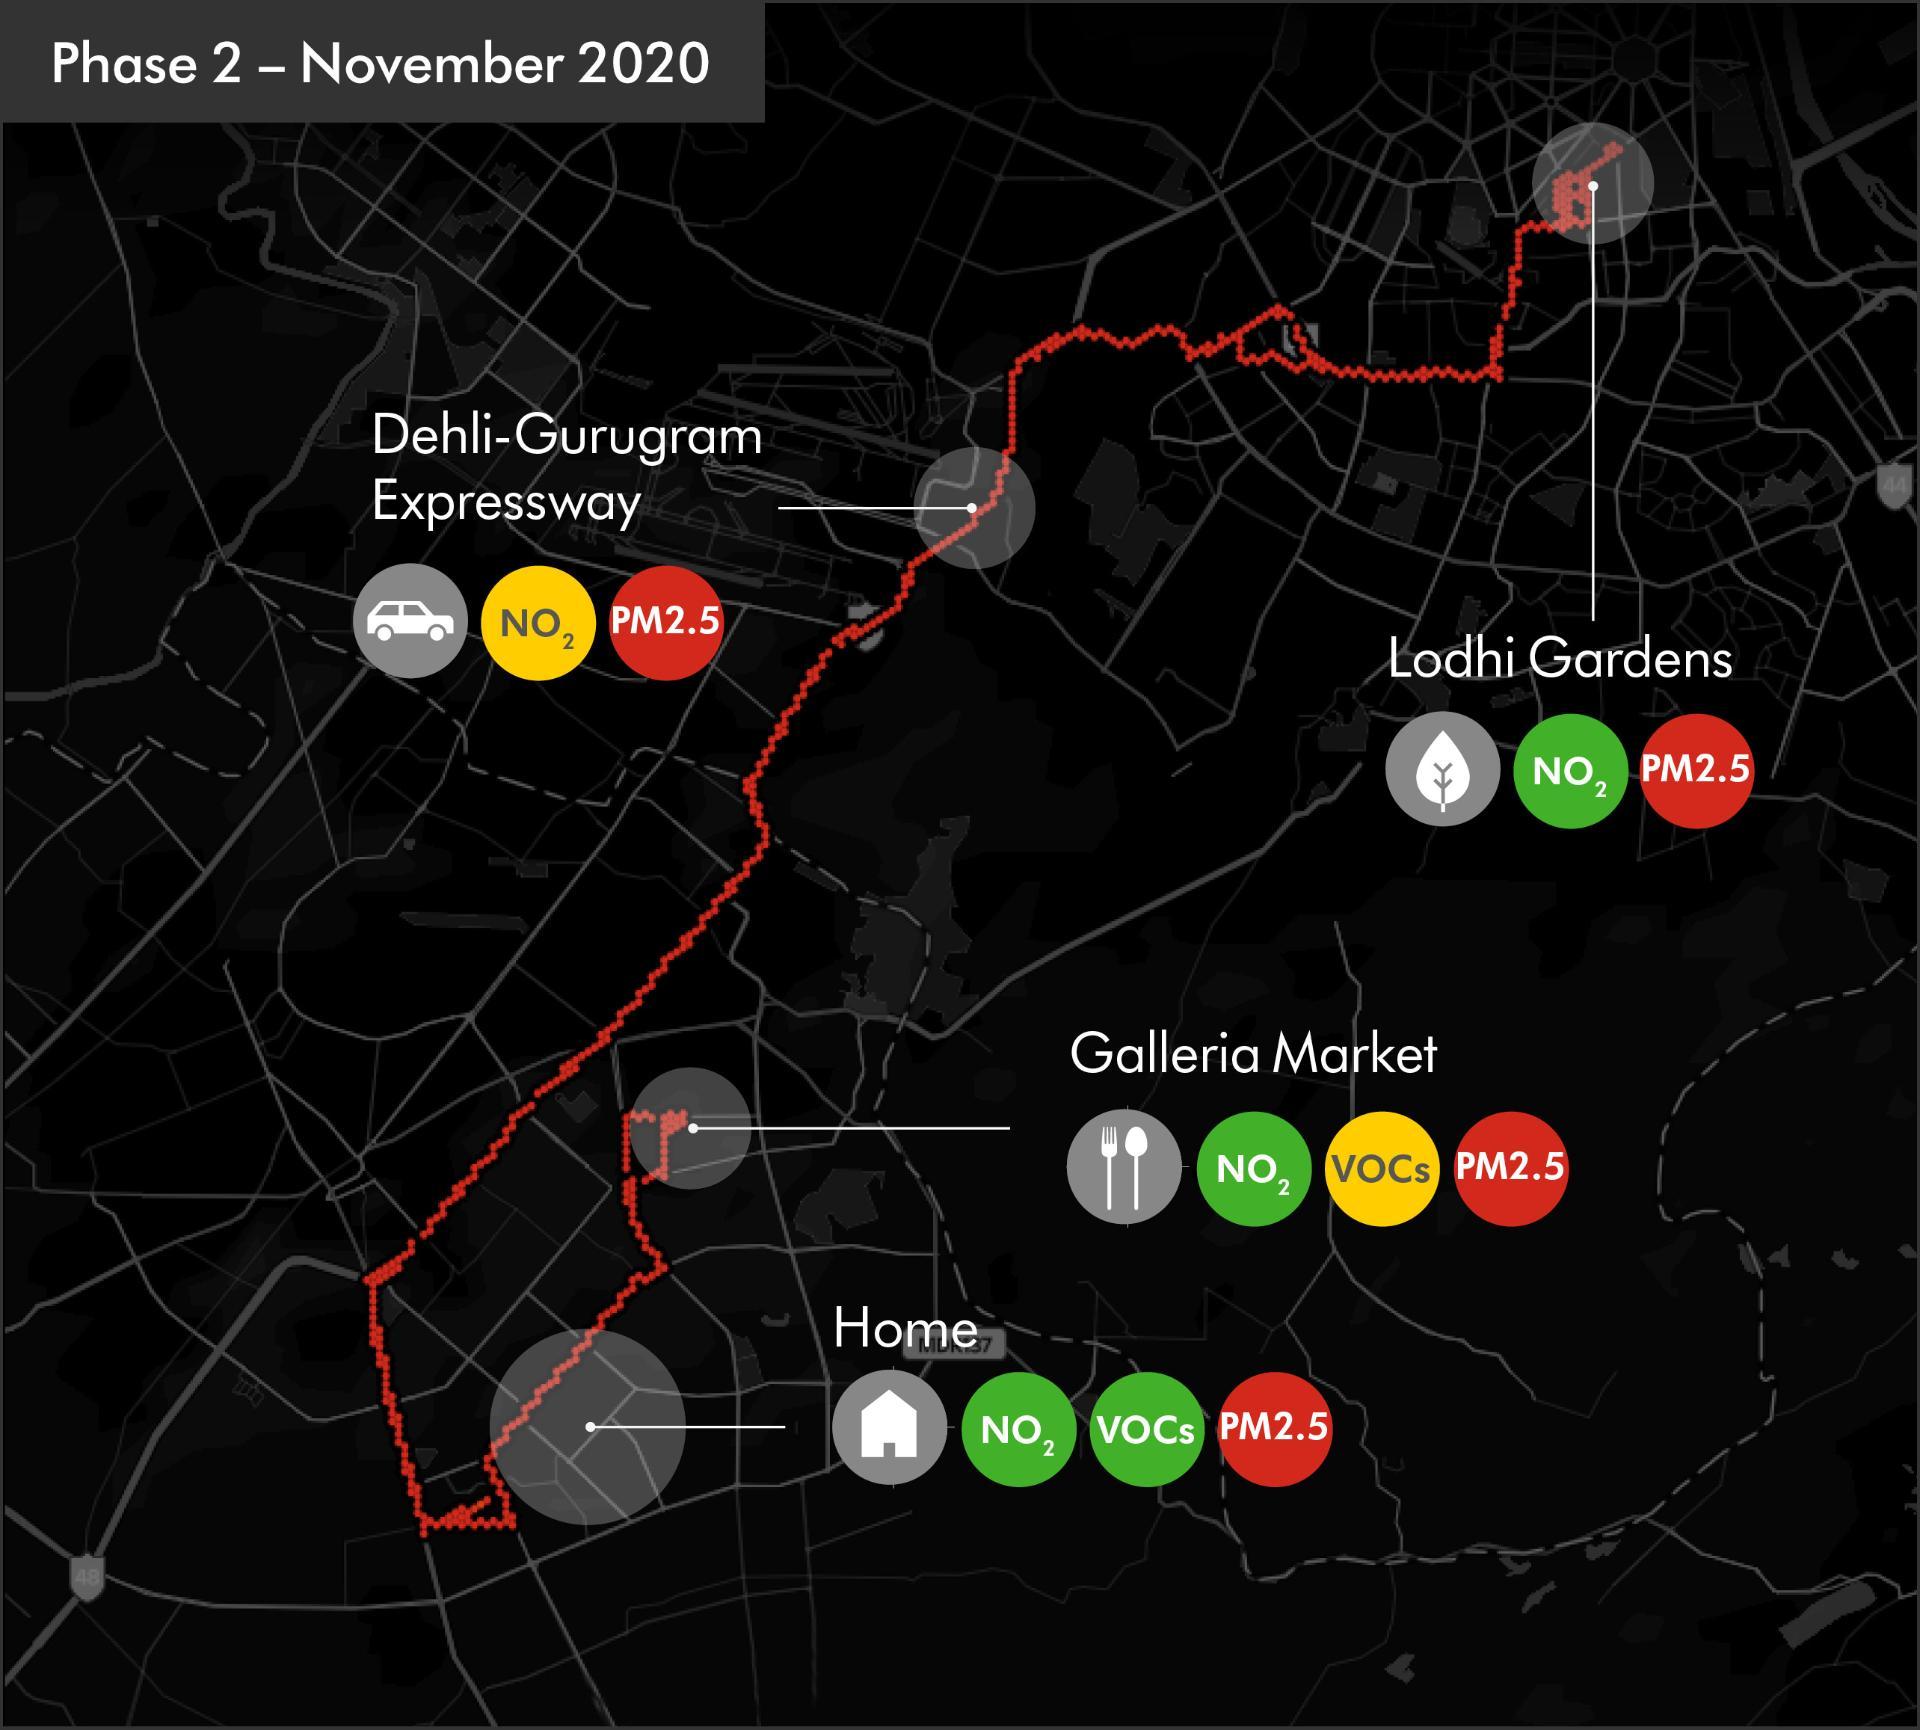 Phase 2 – November 2020